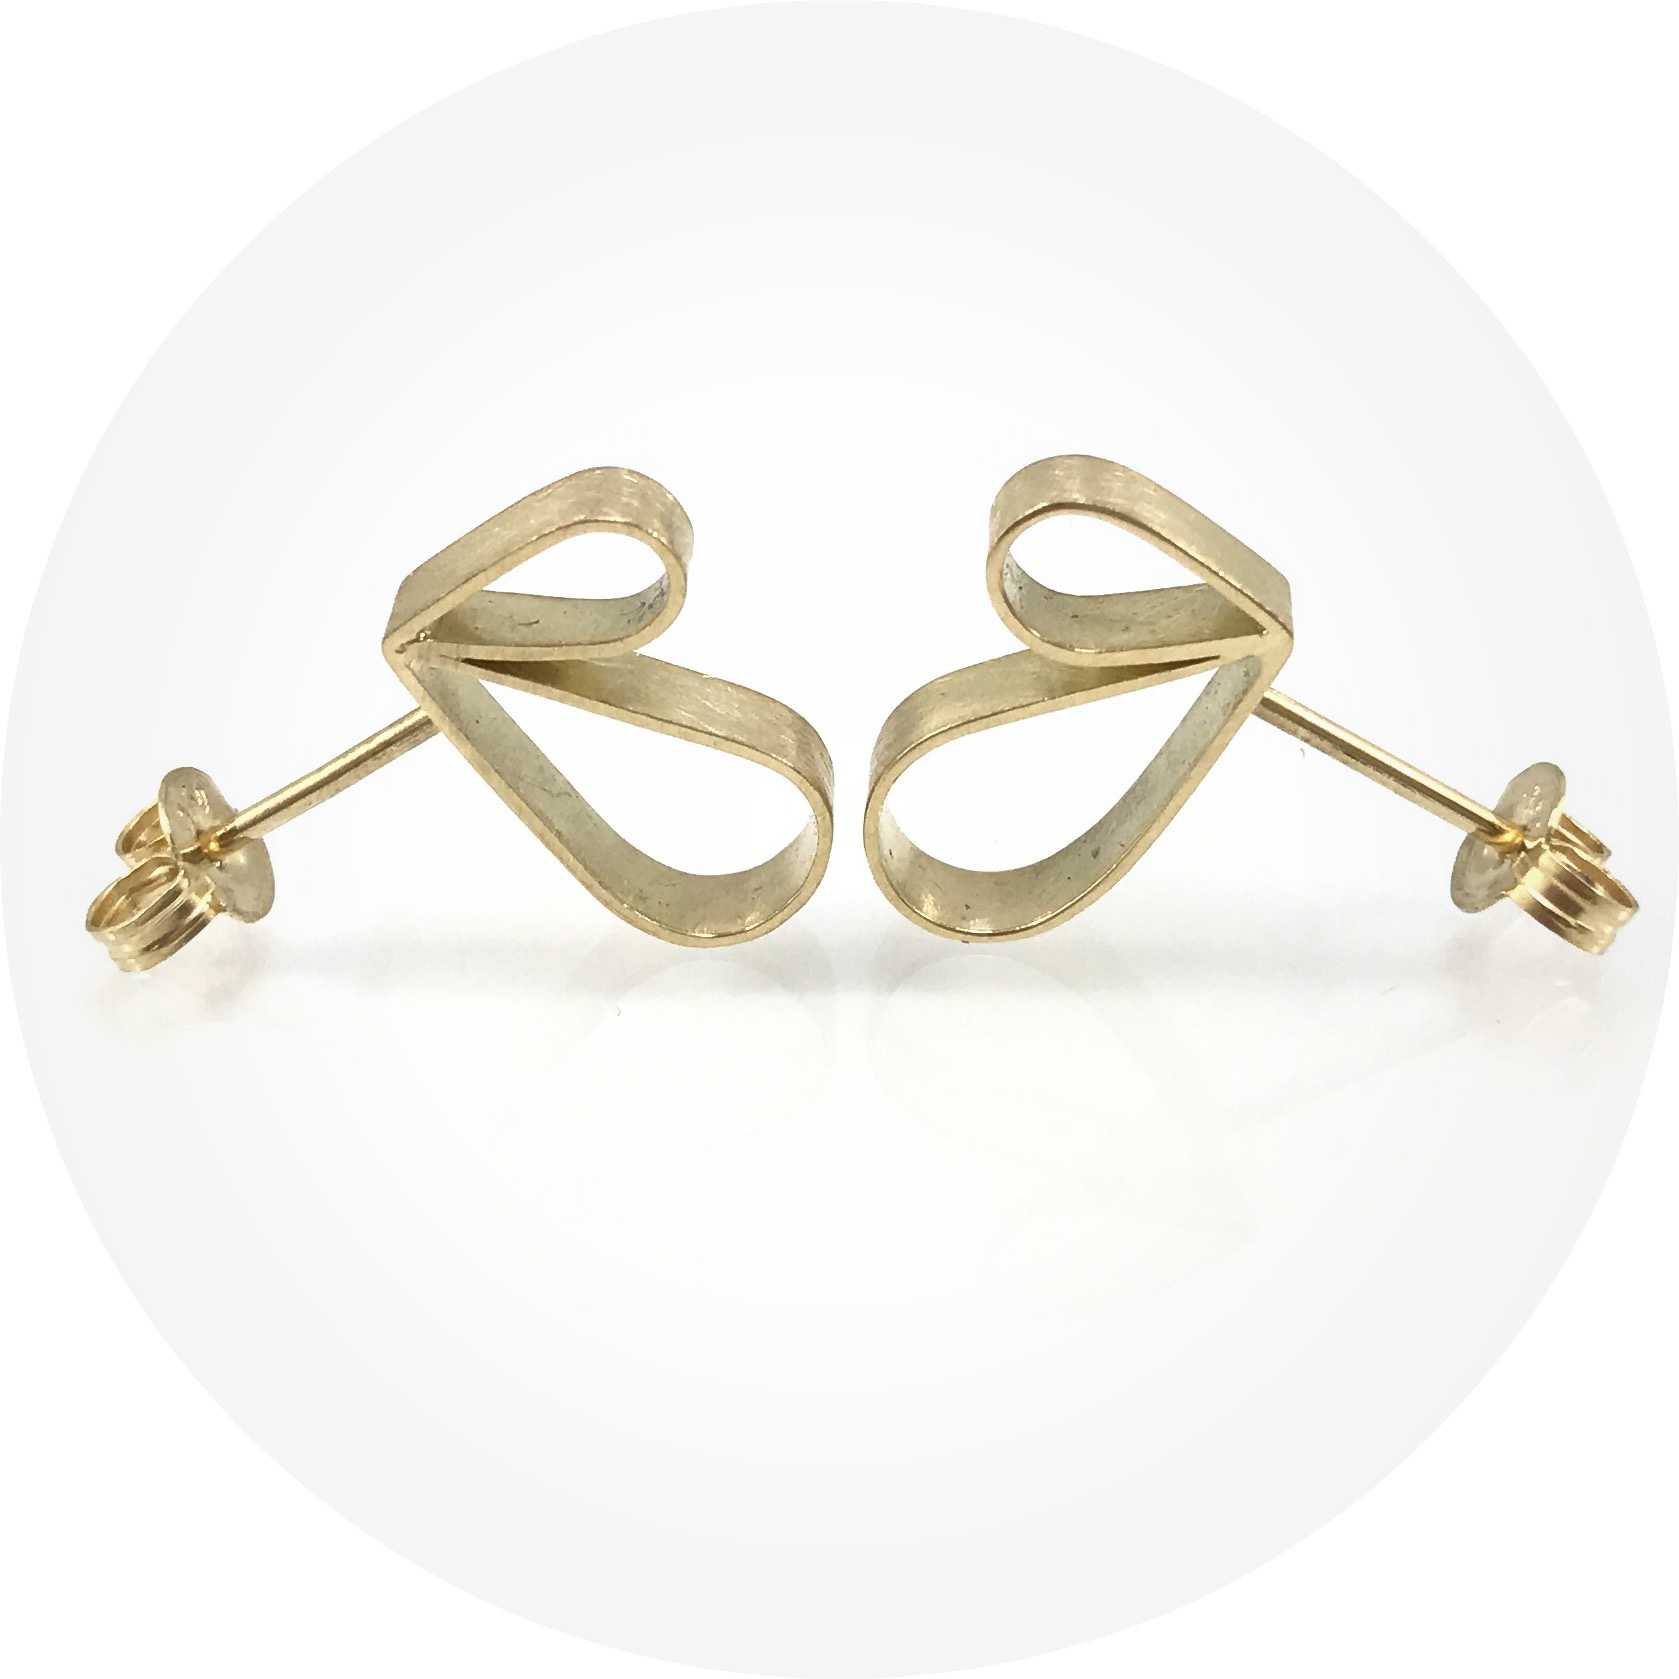 Susan Ewington - Double loop stud earrings in 18ct yellow gold